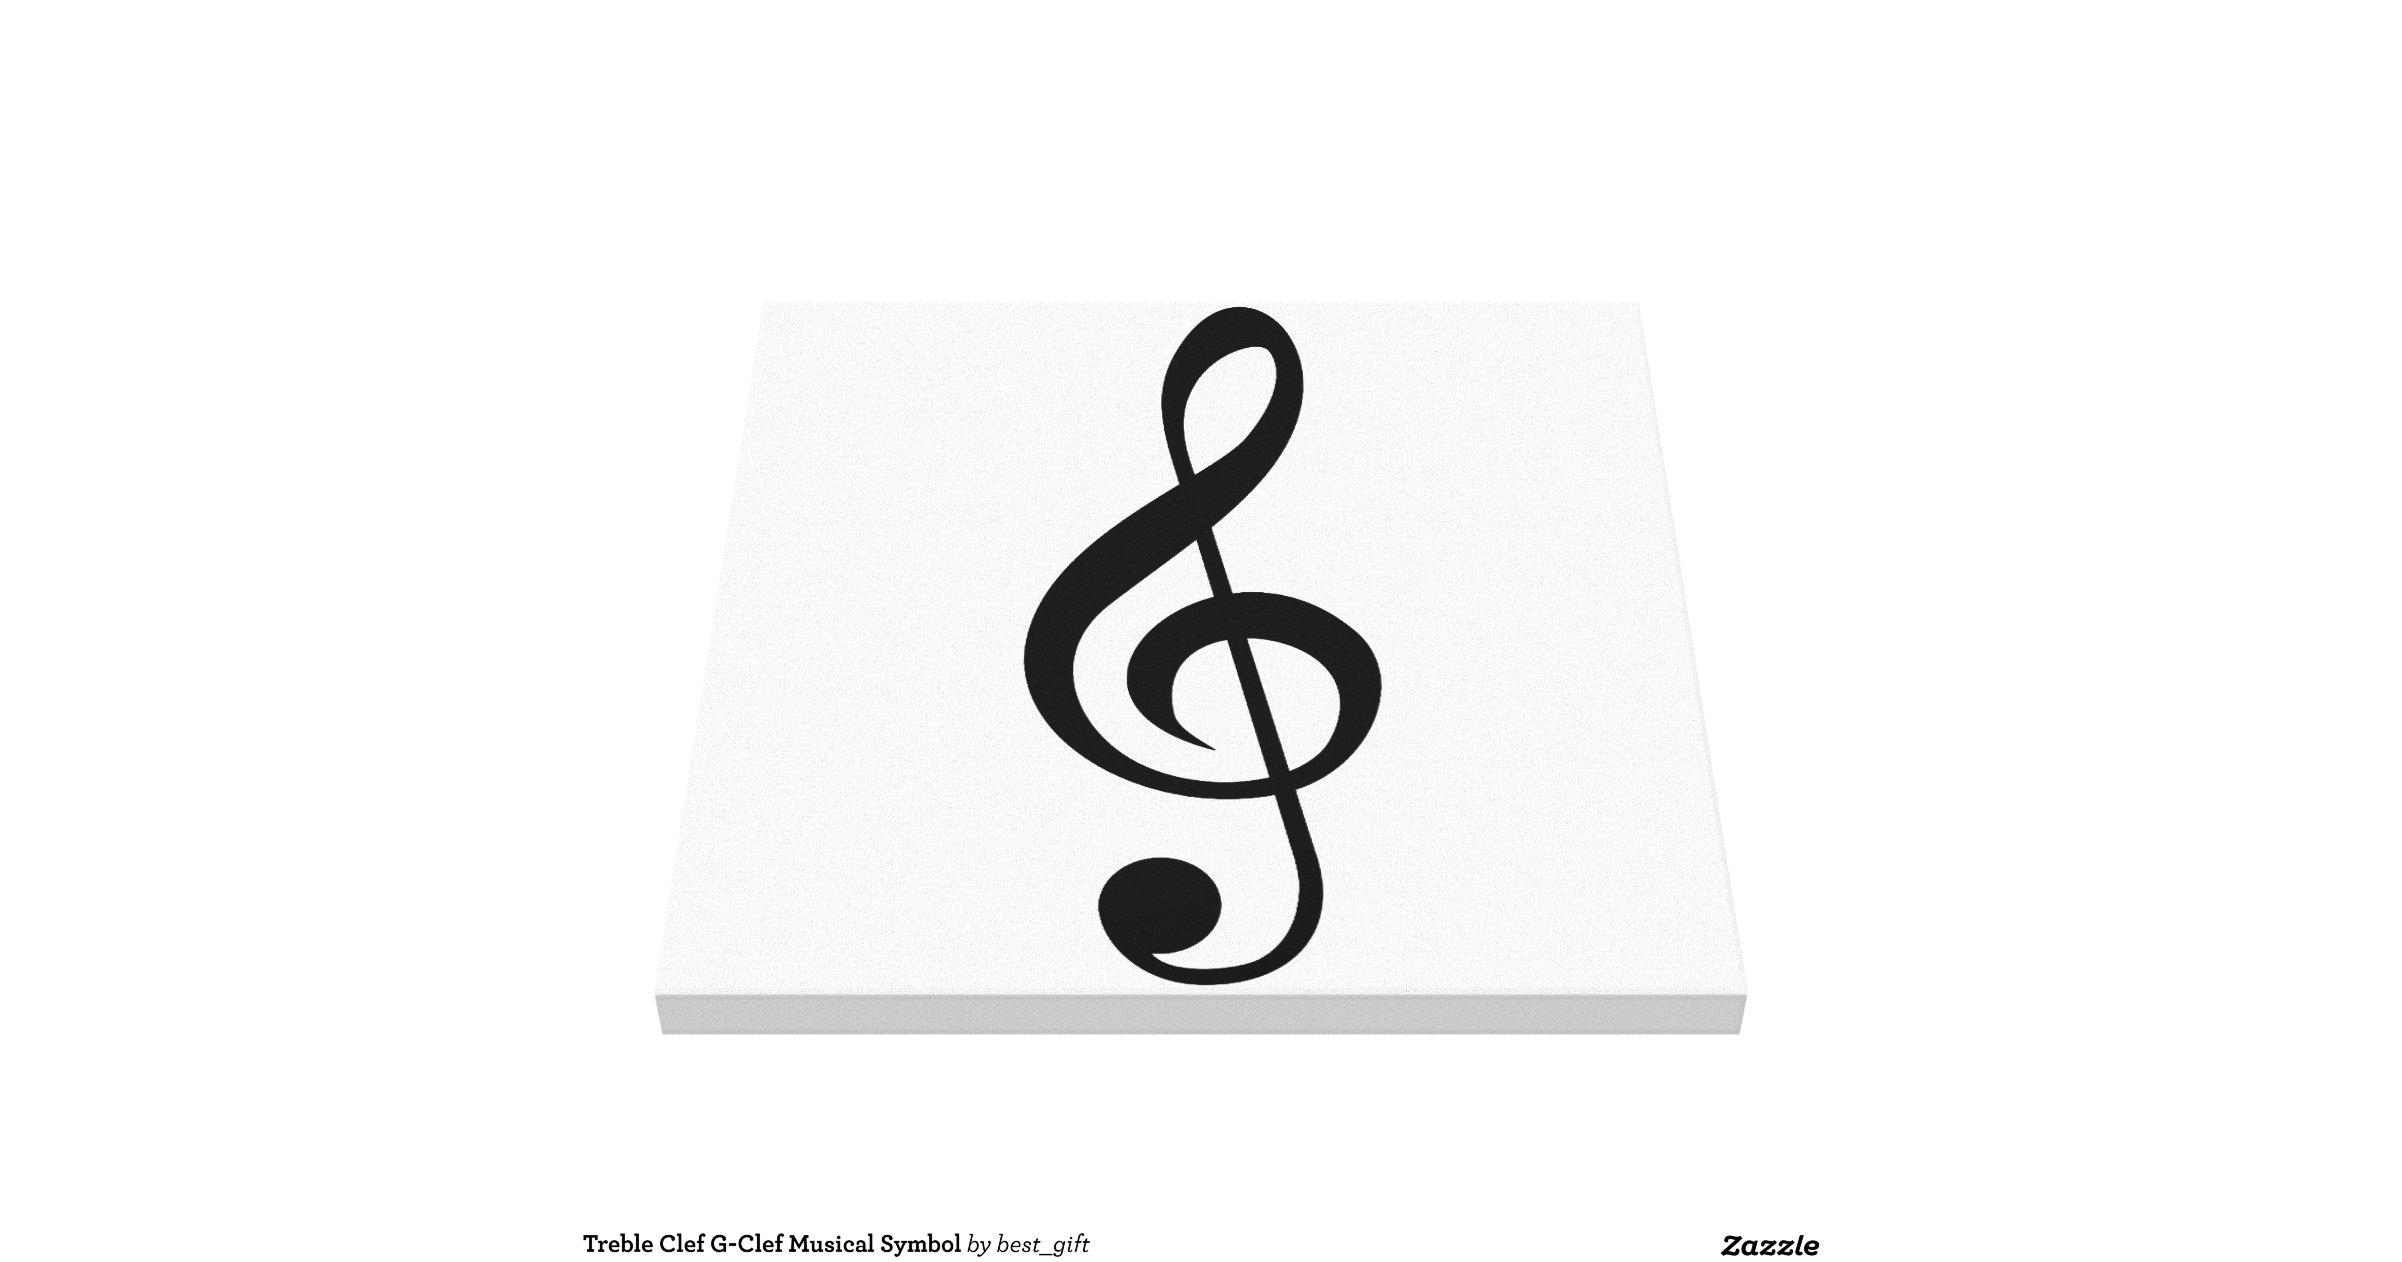 treble clef g